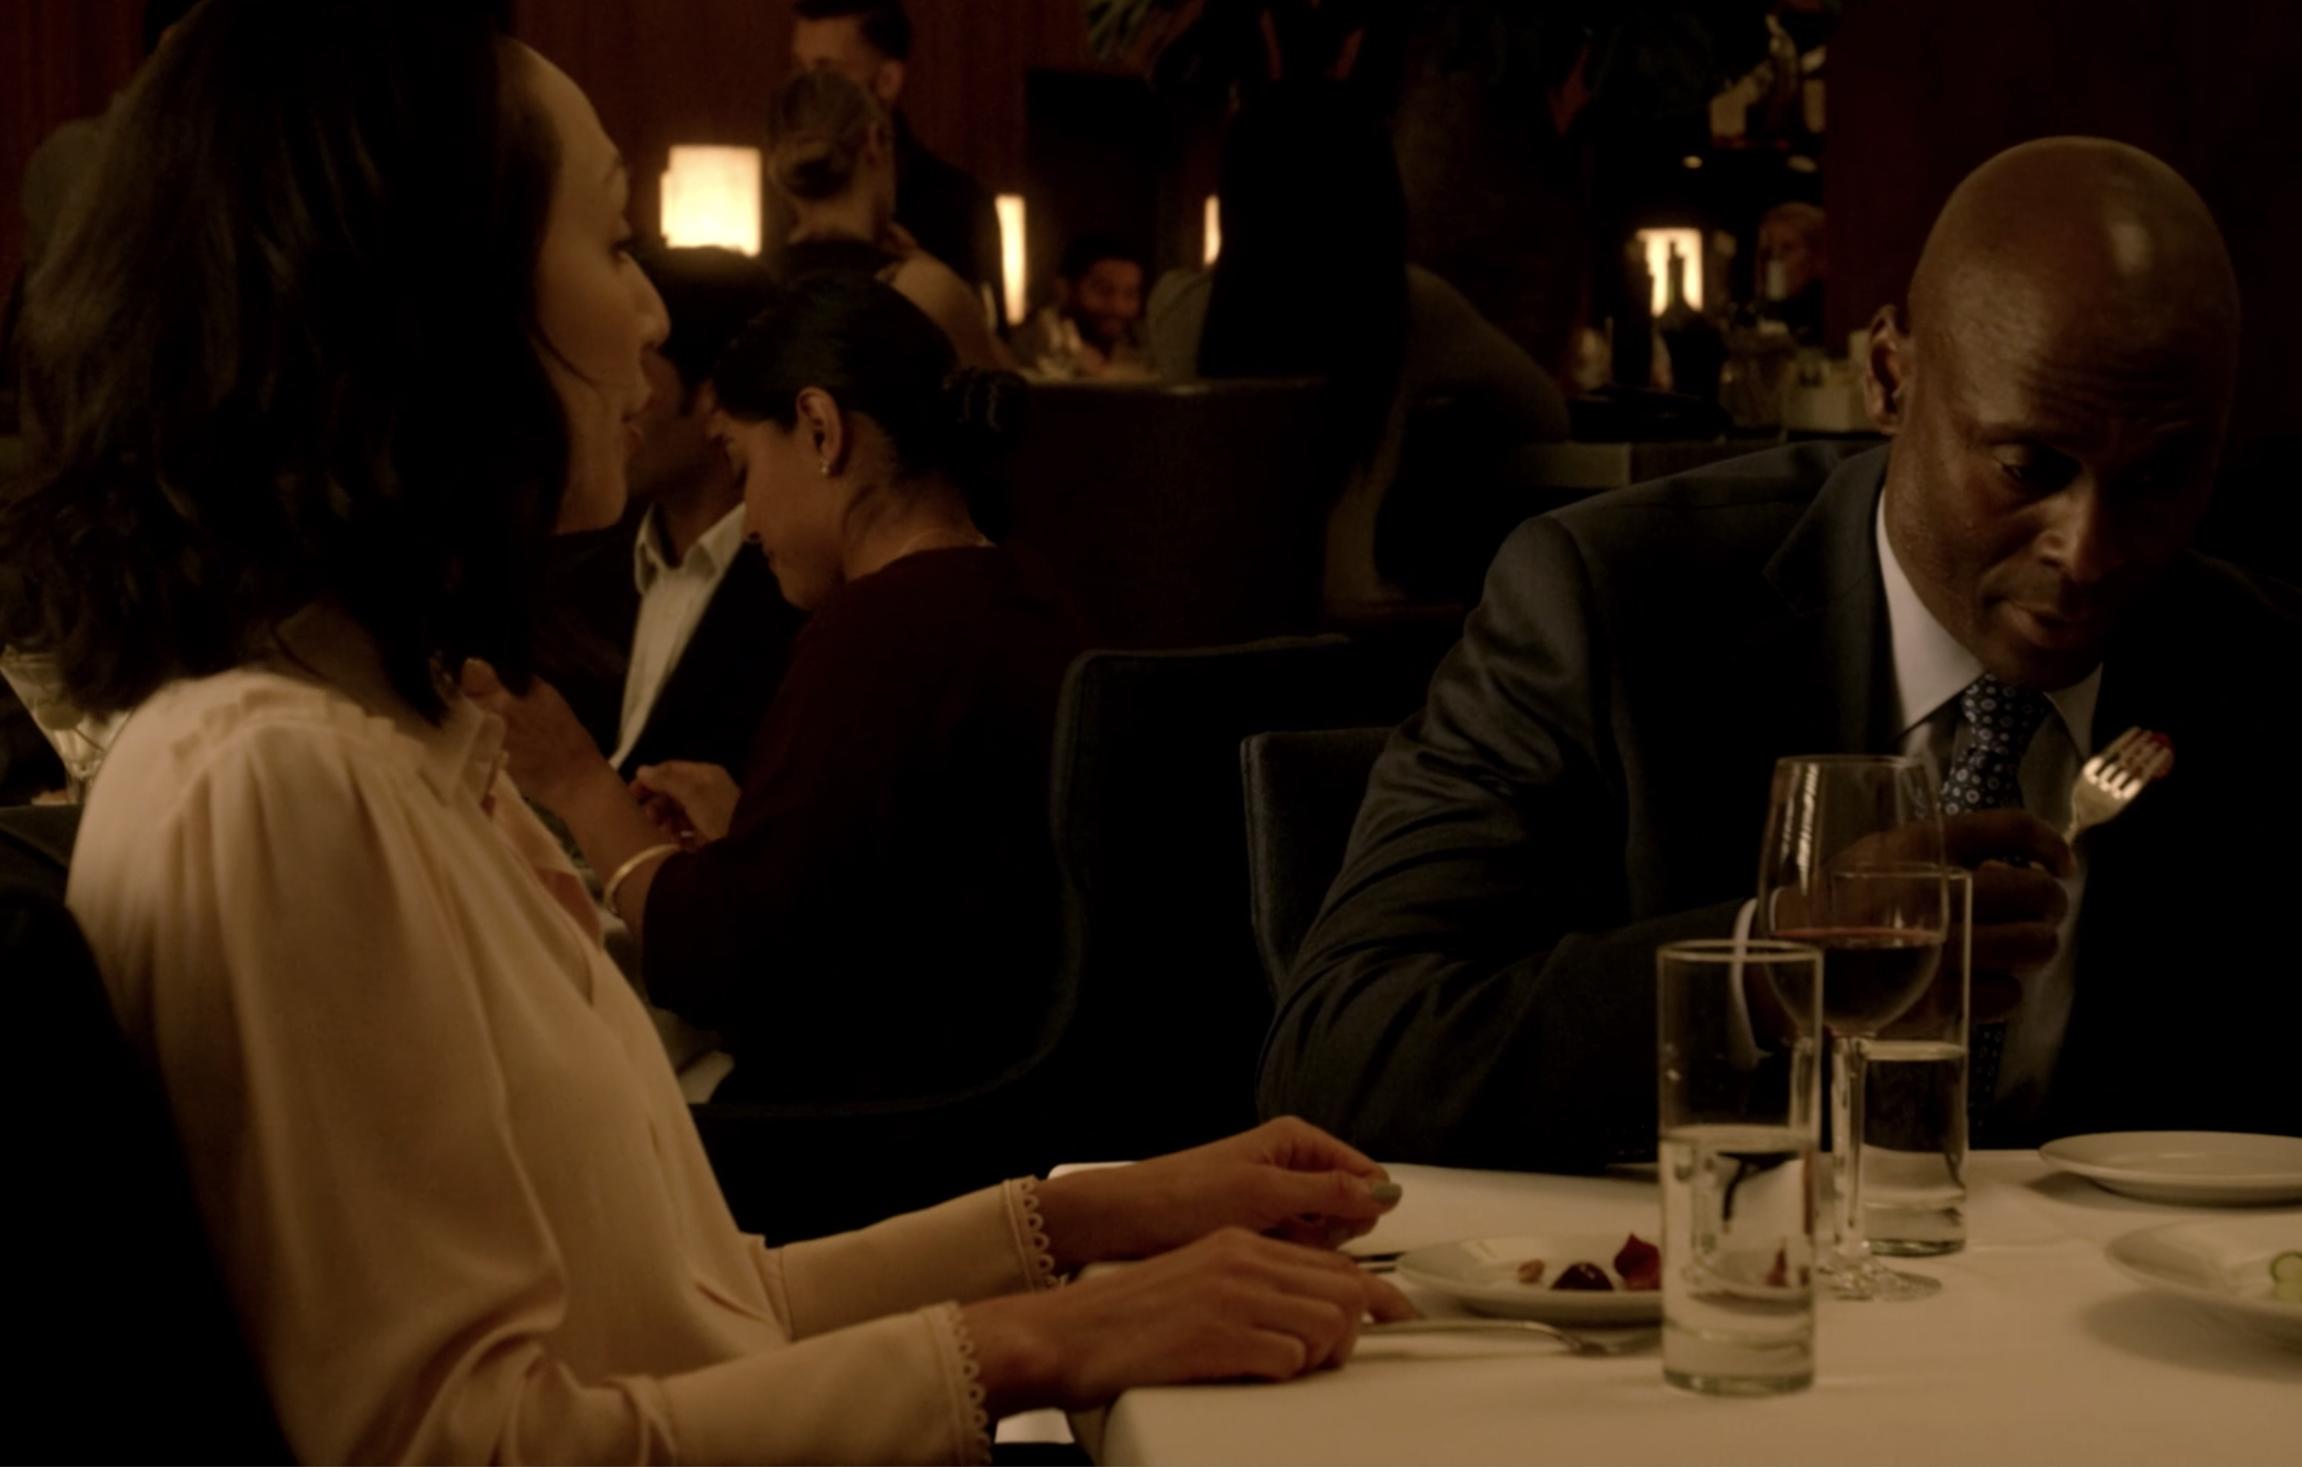 LA Bars and Restaurants Featured in Modern Noir Cop Show